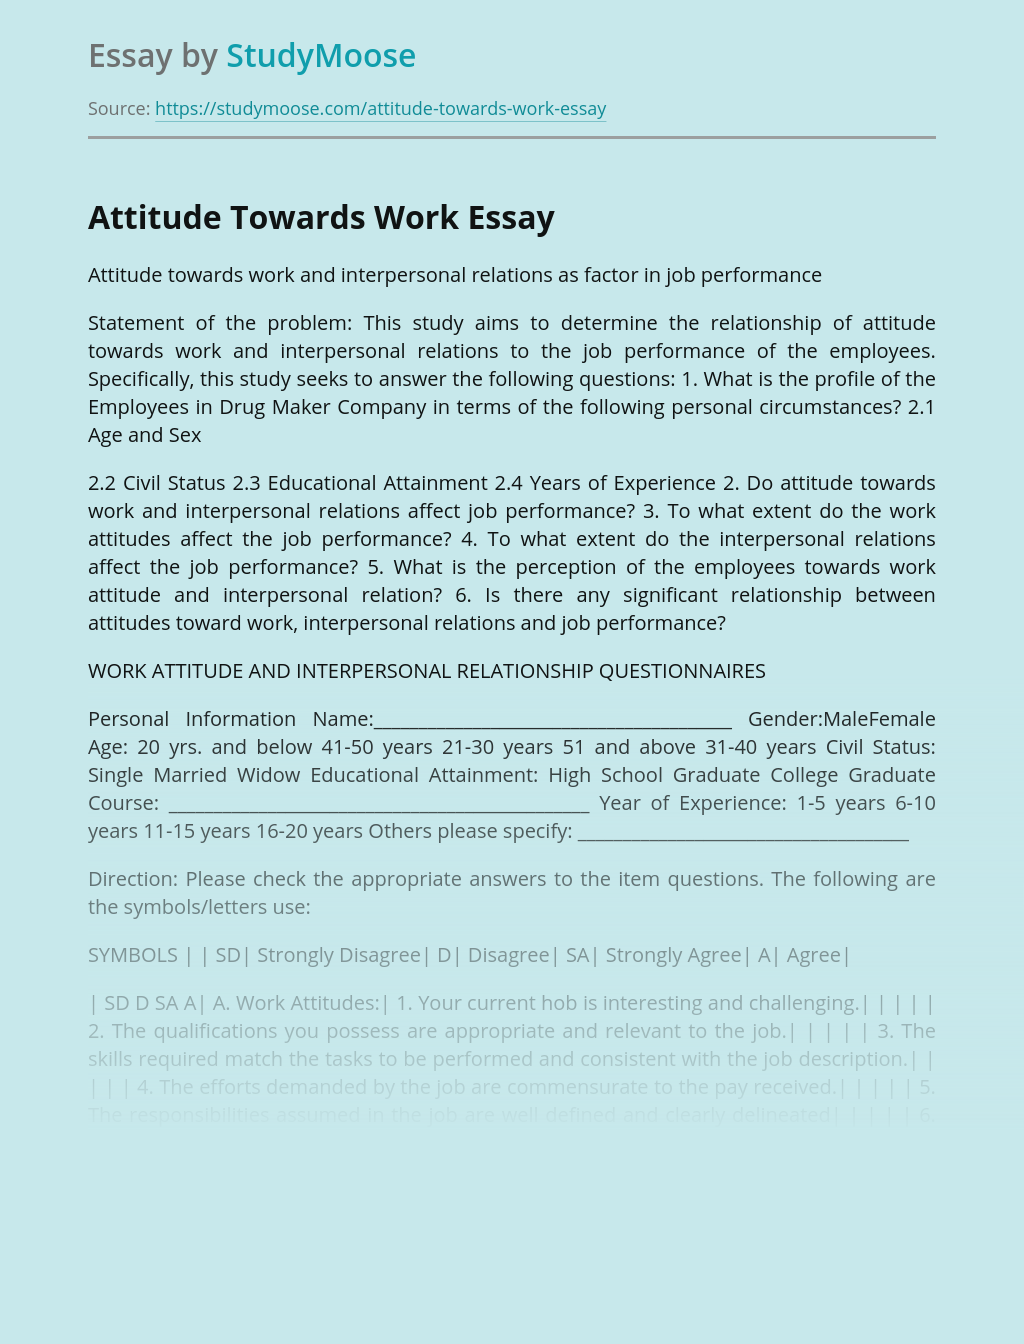 Attitude Towards Work